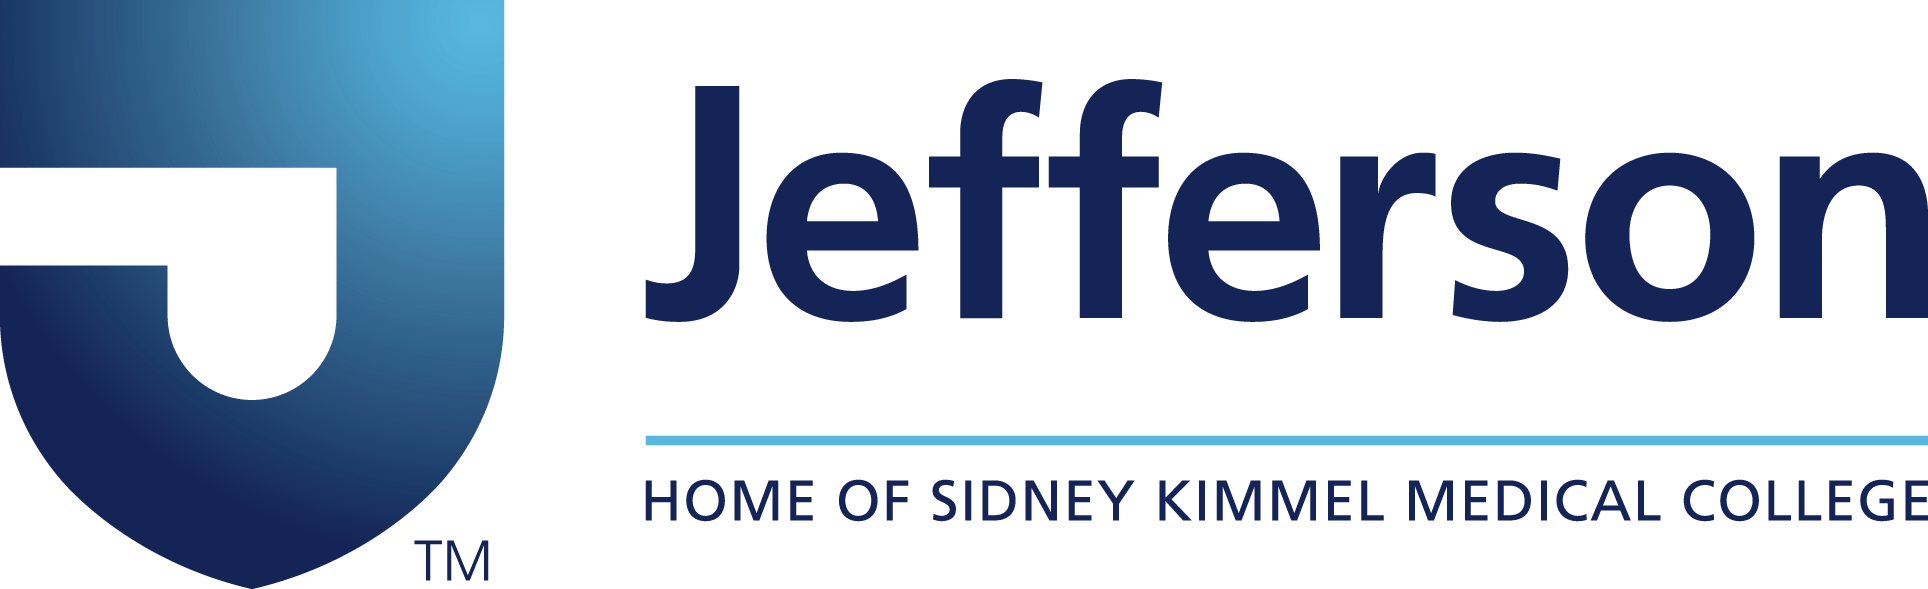 Thomas Jefferson University and Jefferson Health